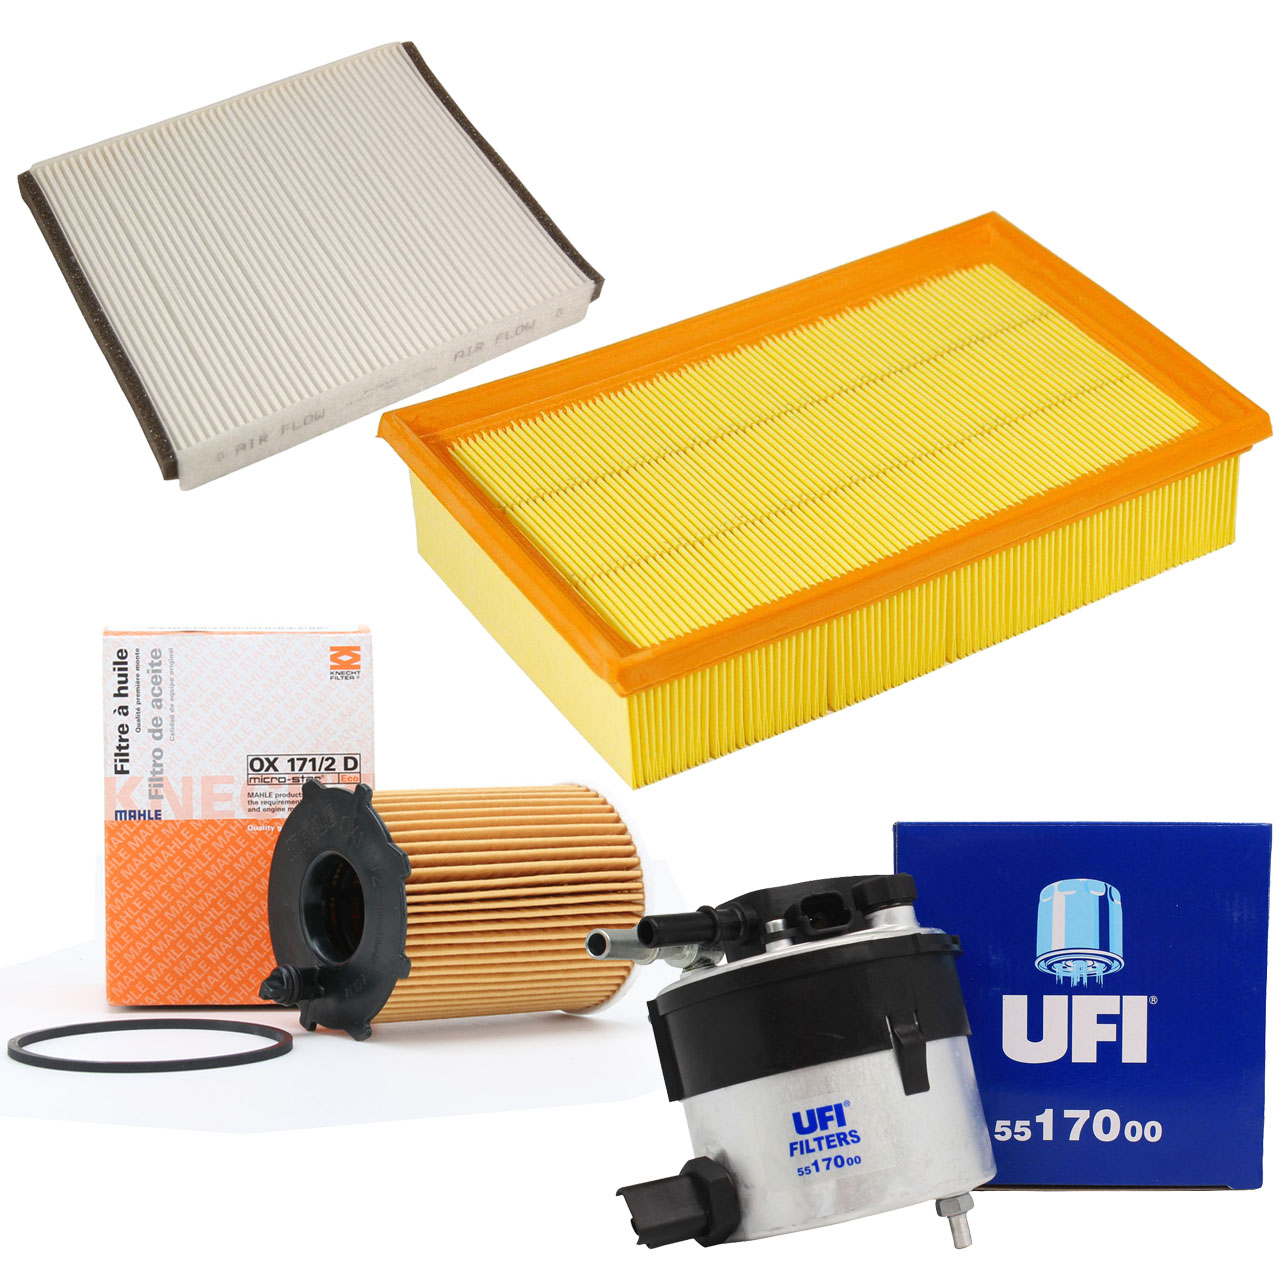 Inspektionskit Filterpaket Filterset für Ford Focus II Volvo C30 S40 II V50 1.6D